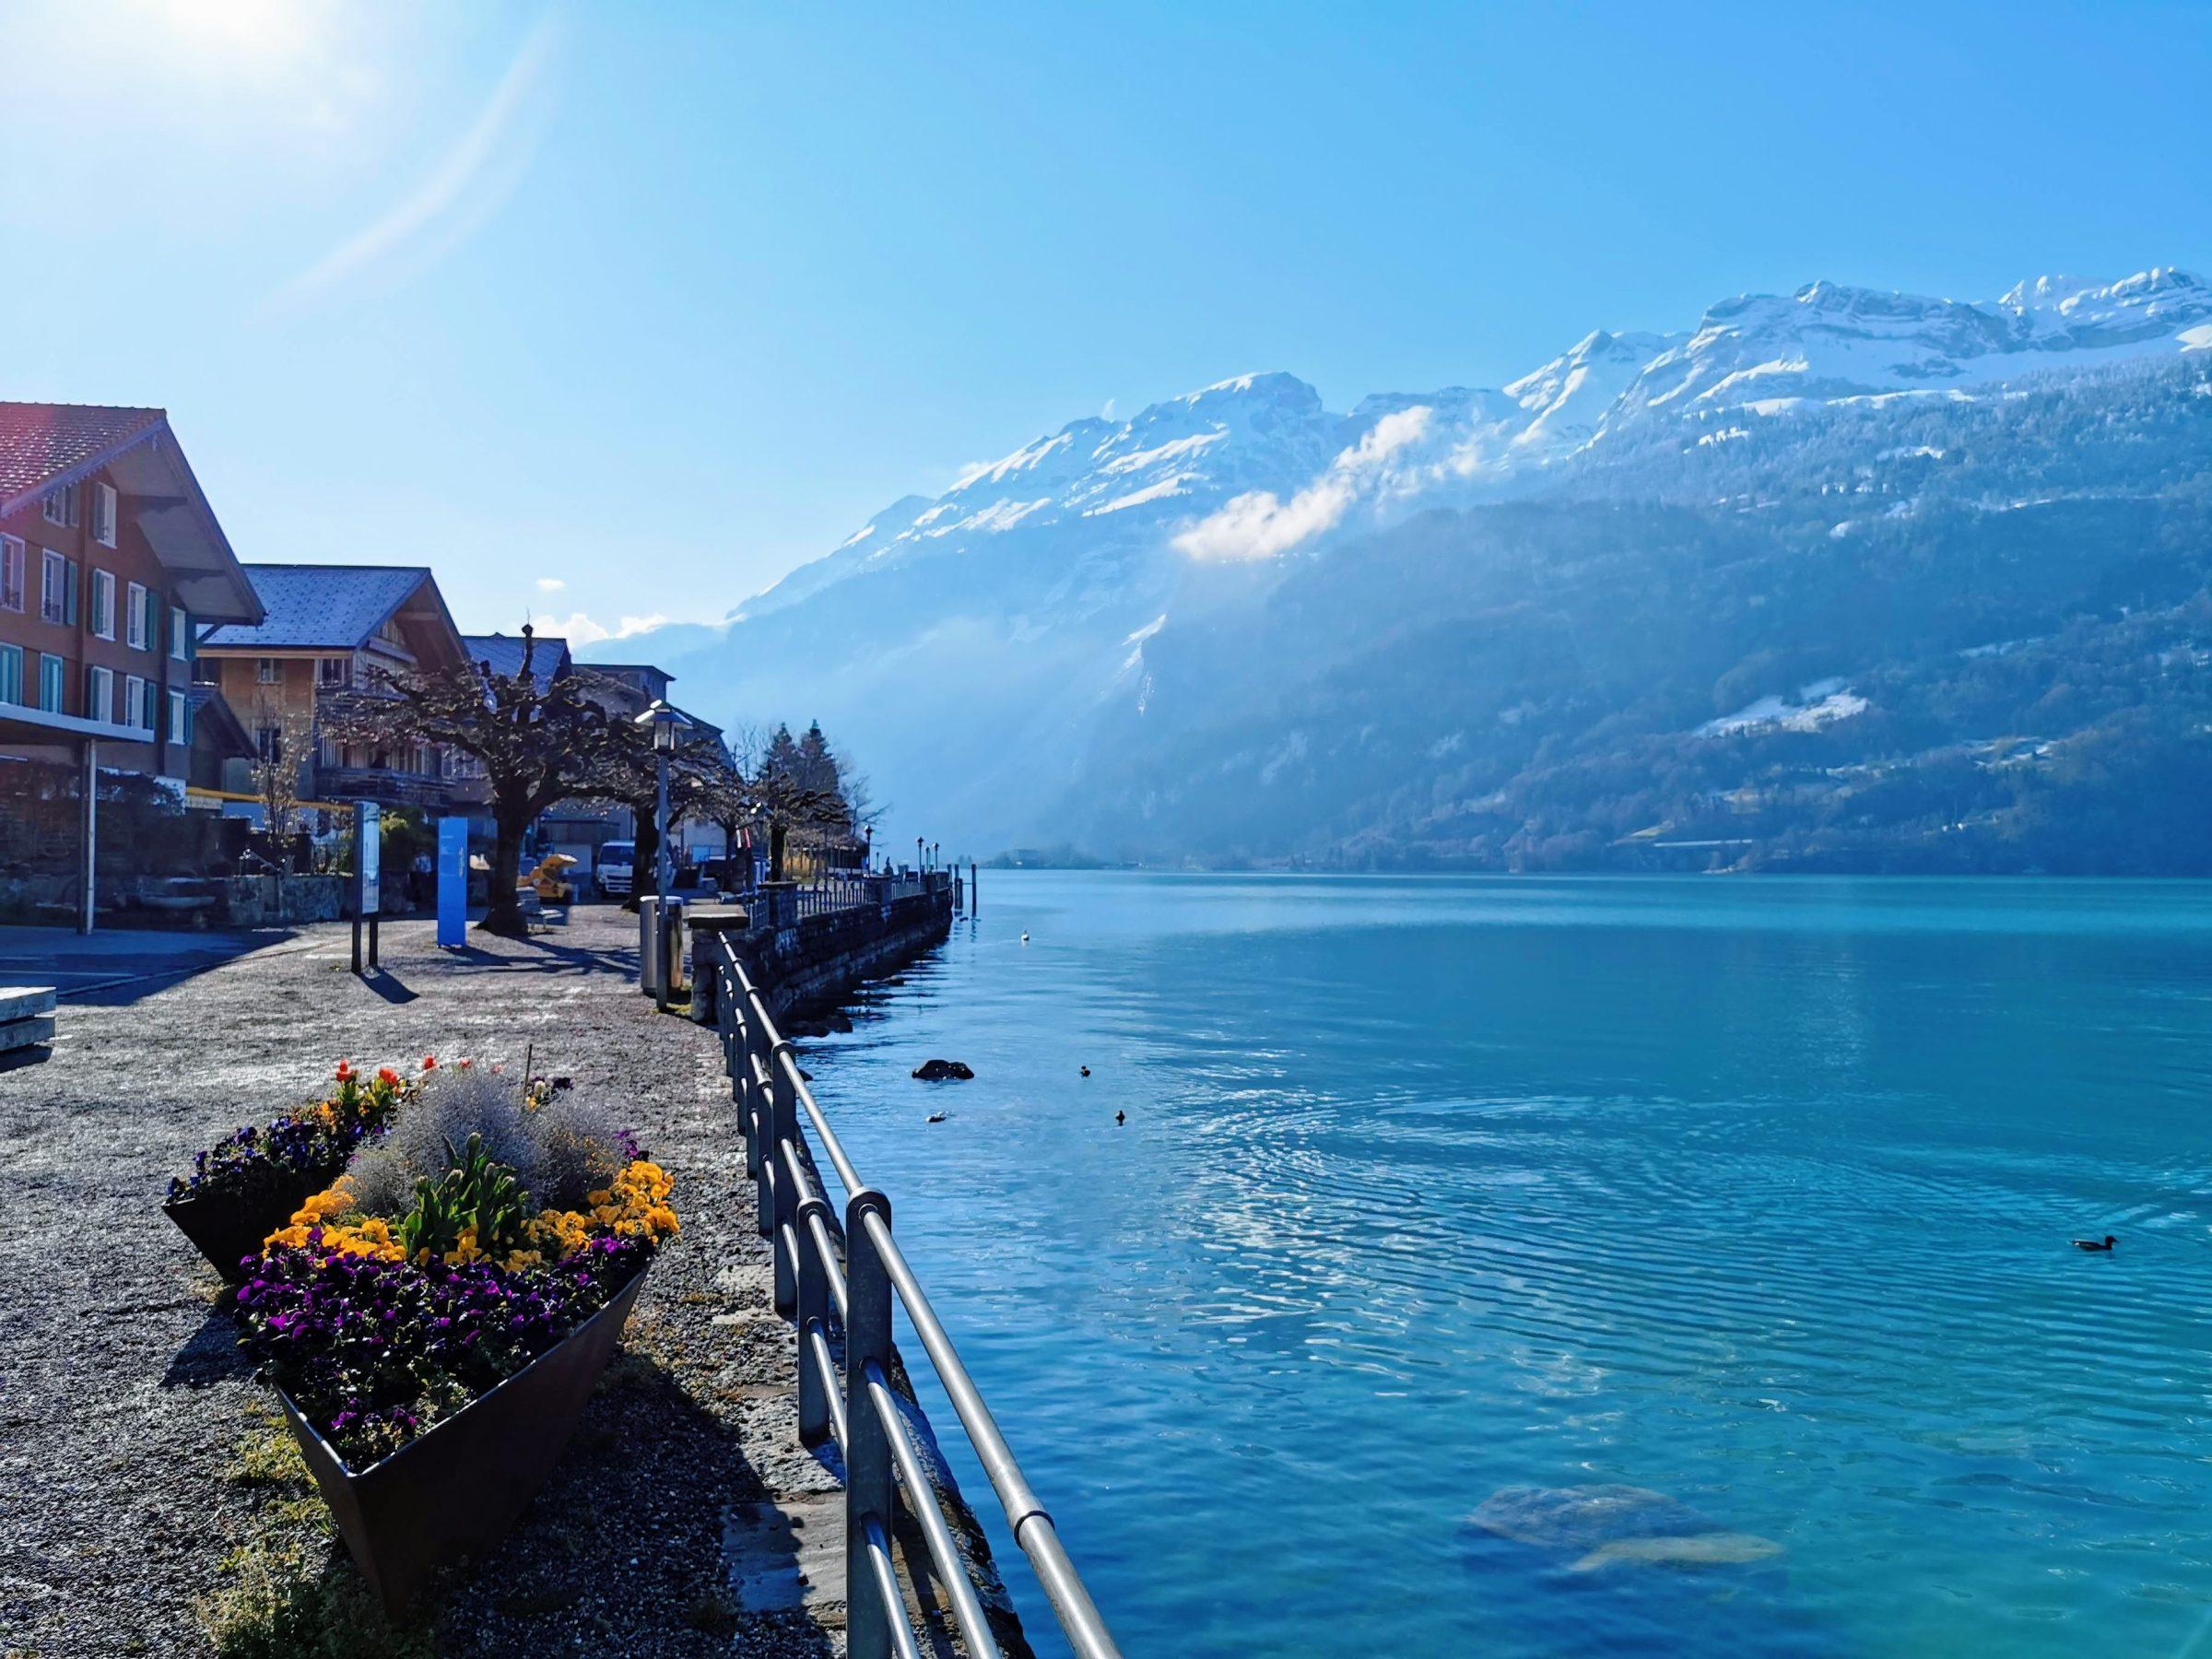 Lake Brienz bij Interlaken